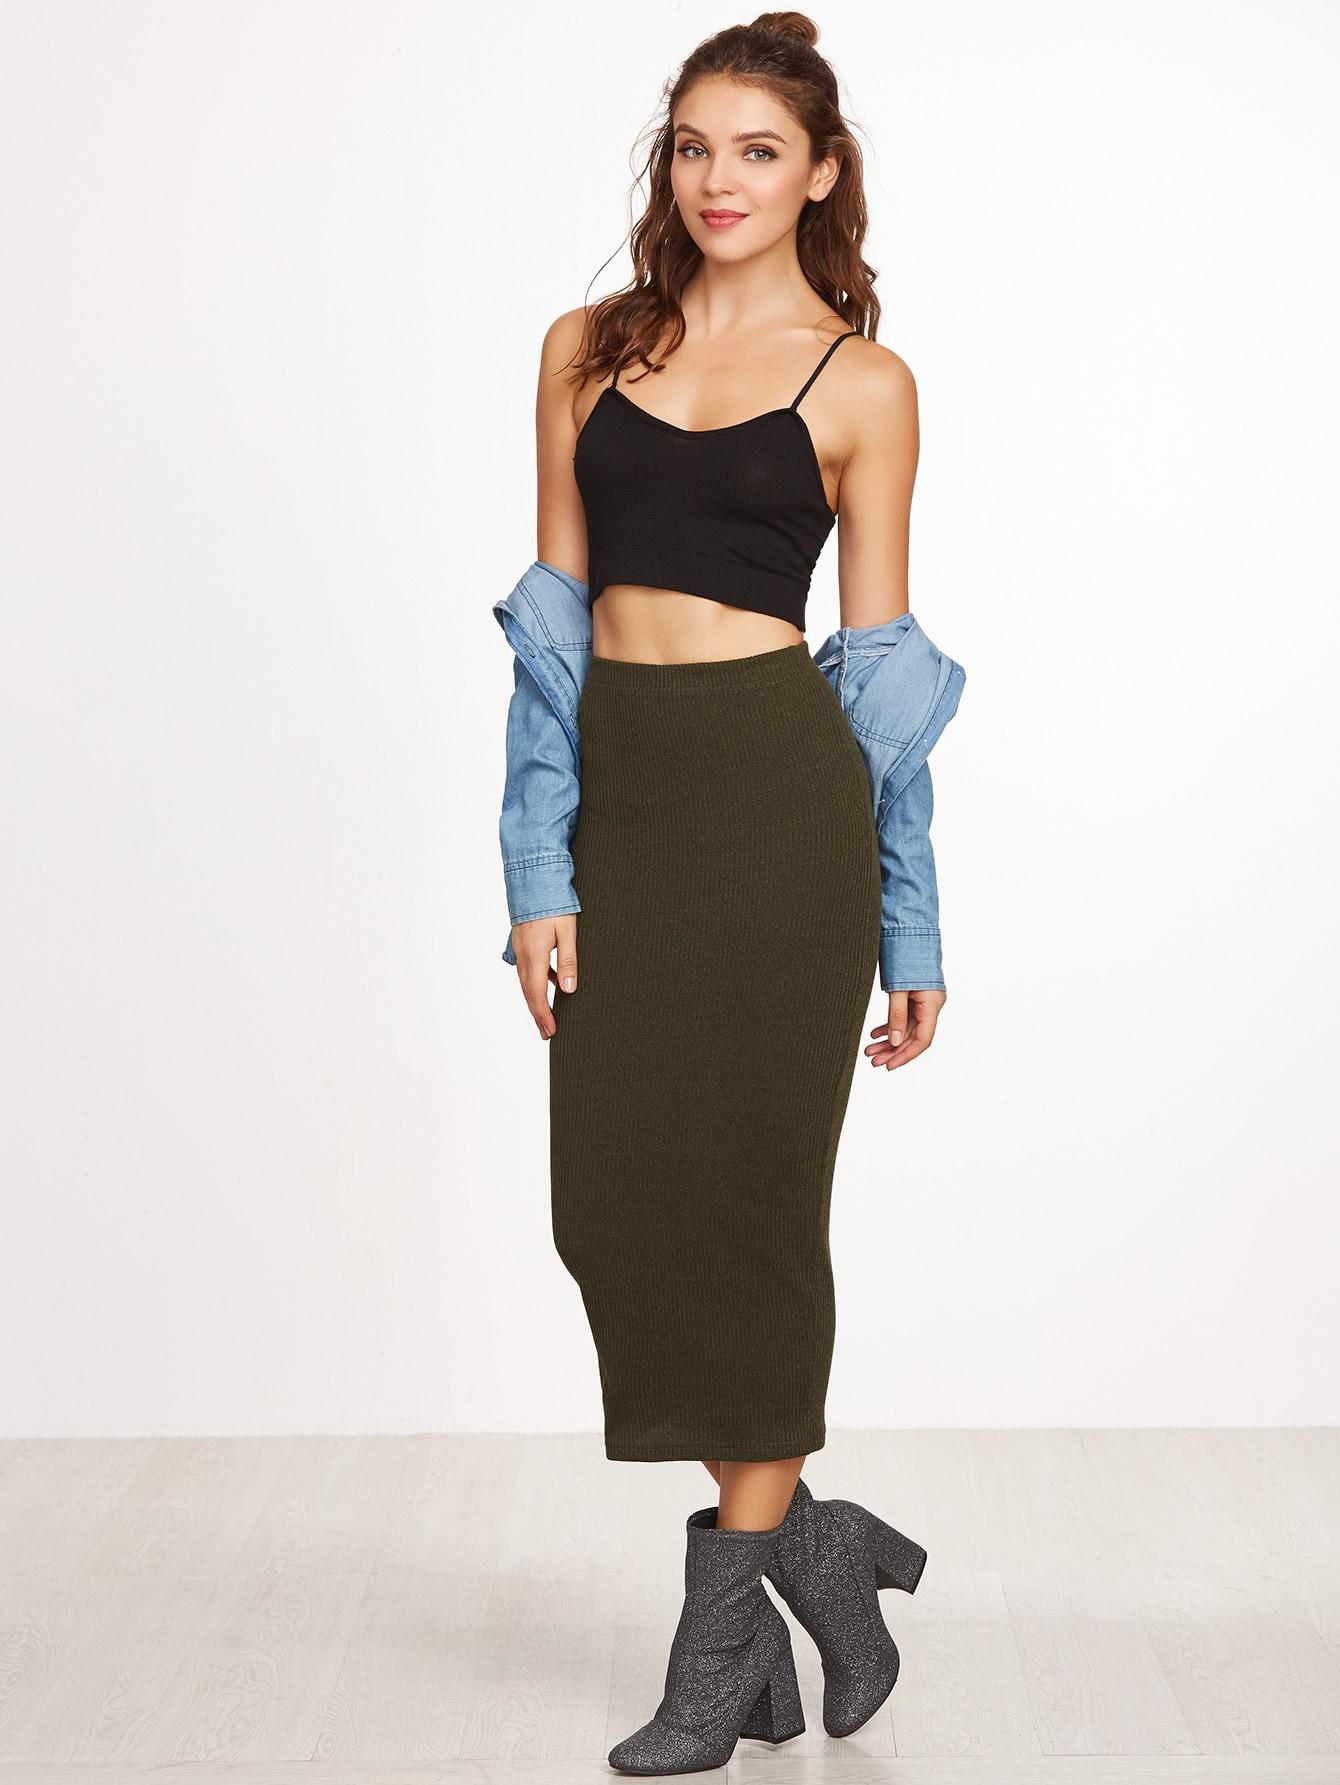 Ribbed Knit Pencil Skirt skirt161115701